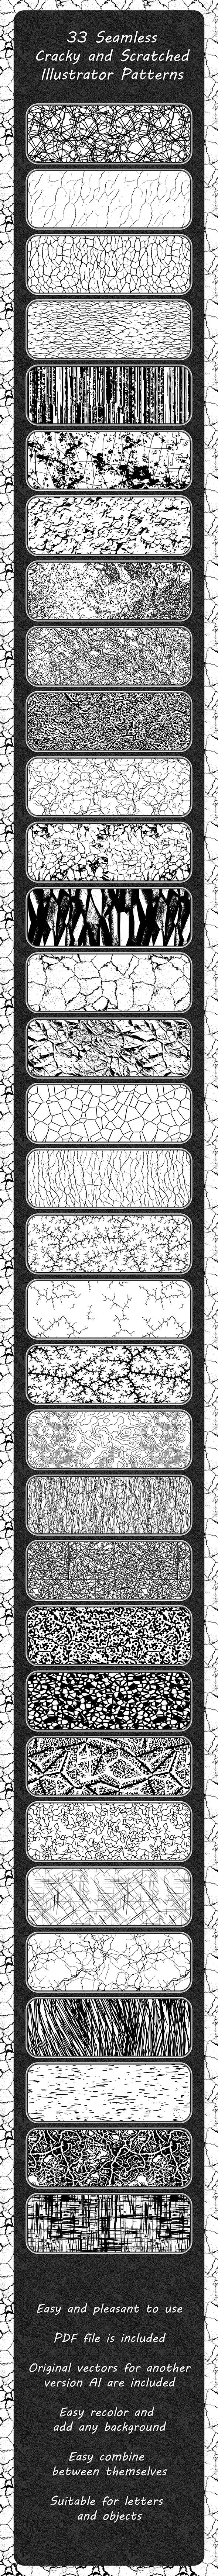 33 Cracky and Scratches Grunge Adobe Illustrator Patterns - Textures / Fills / Patterns Illustrator